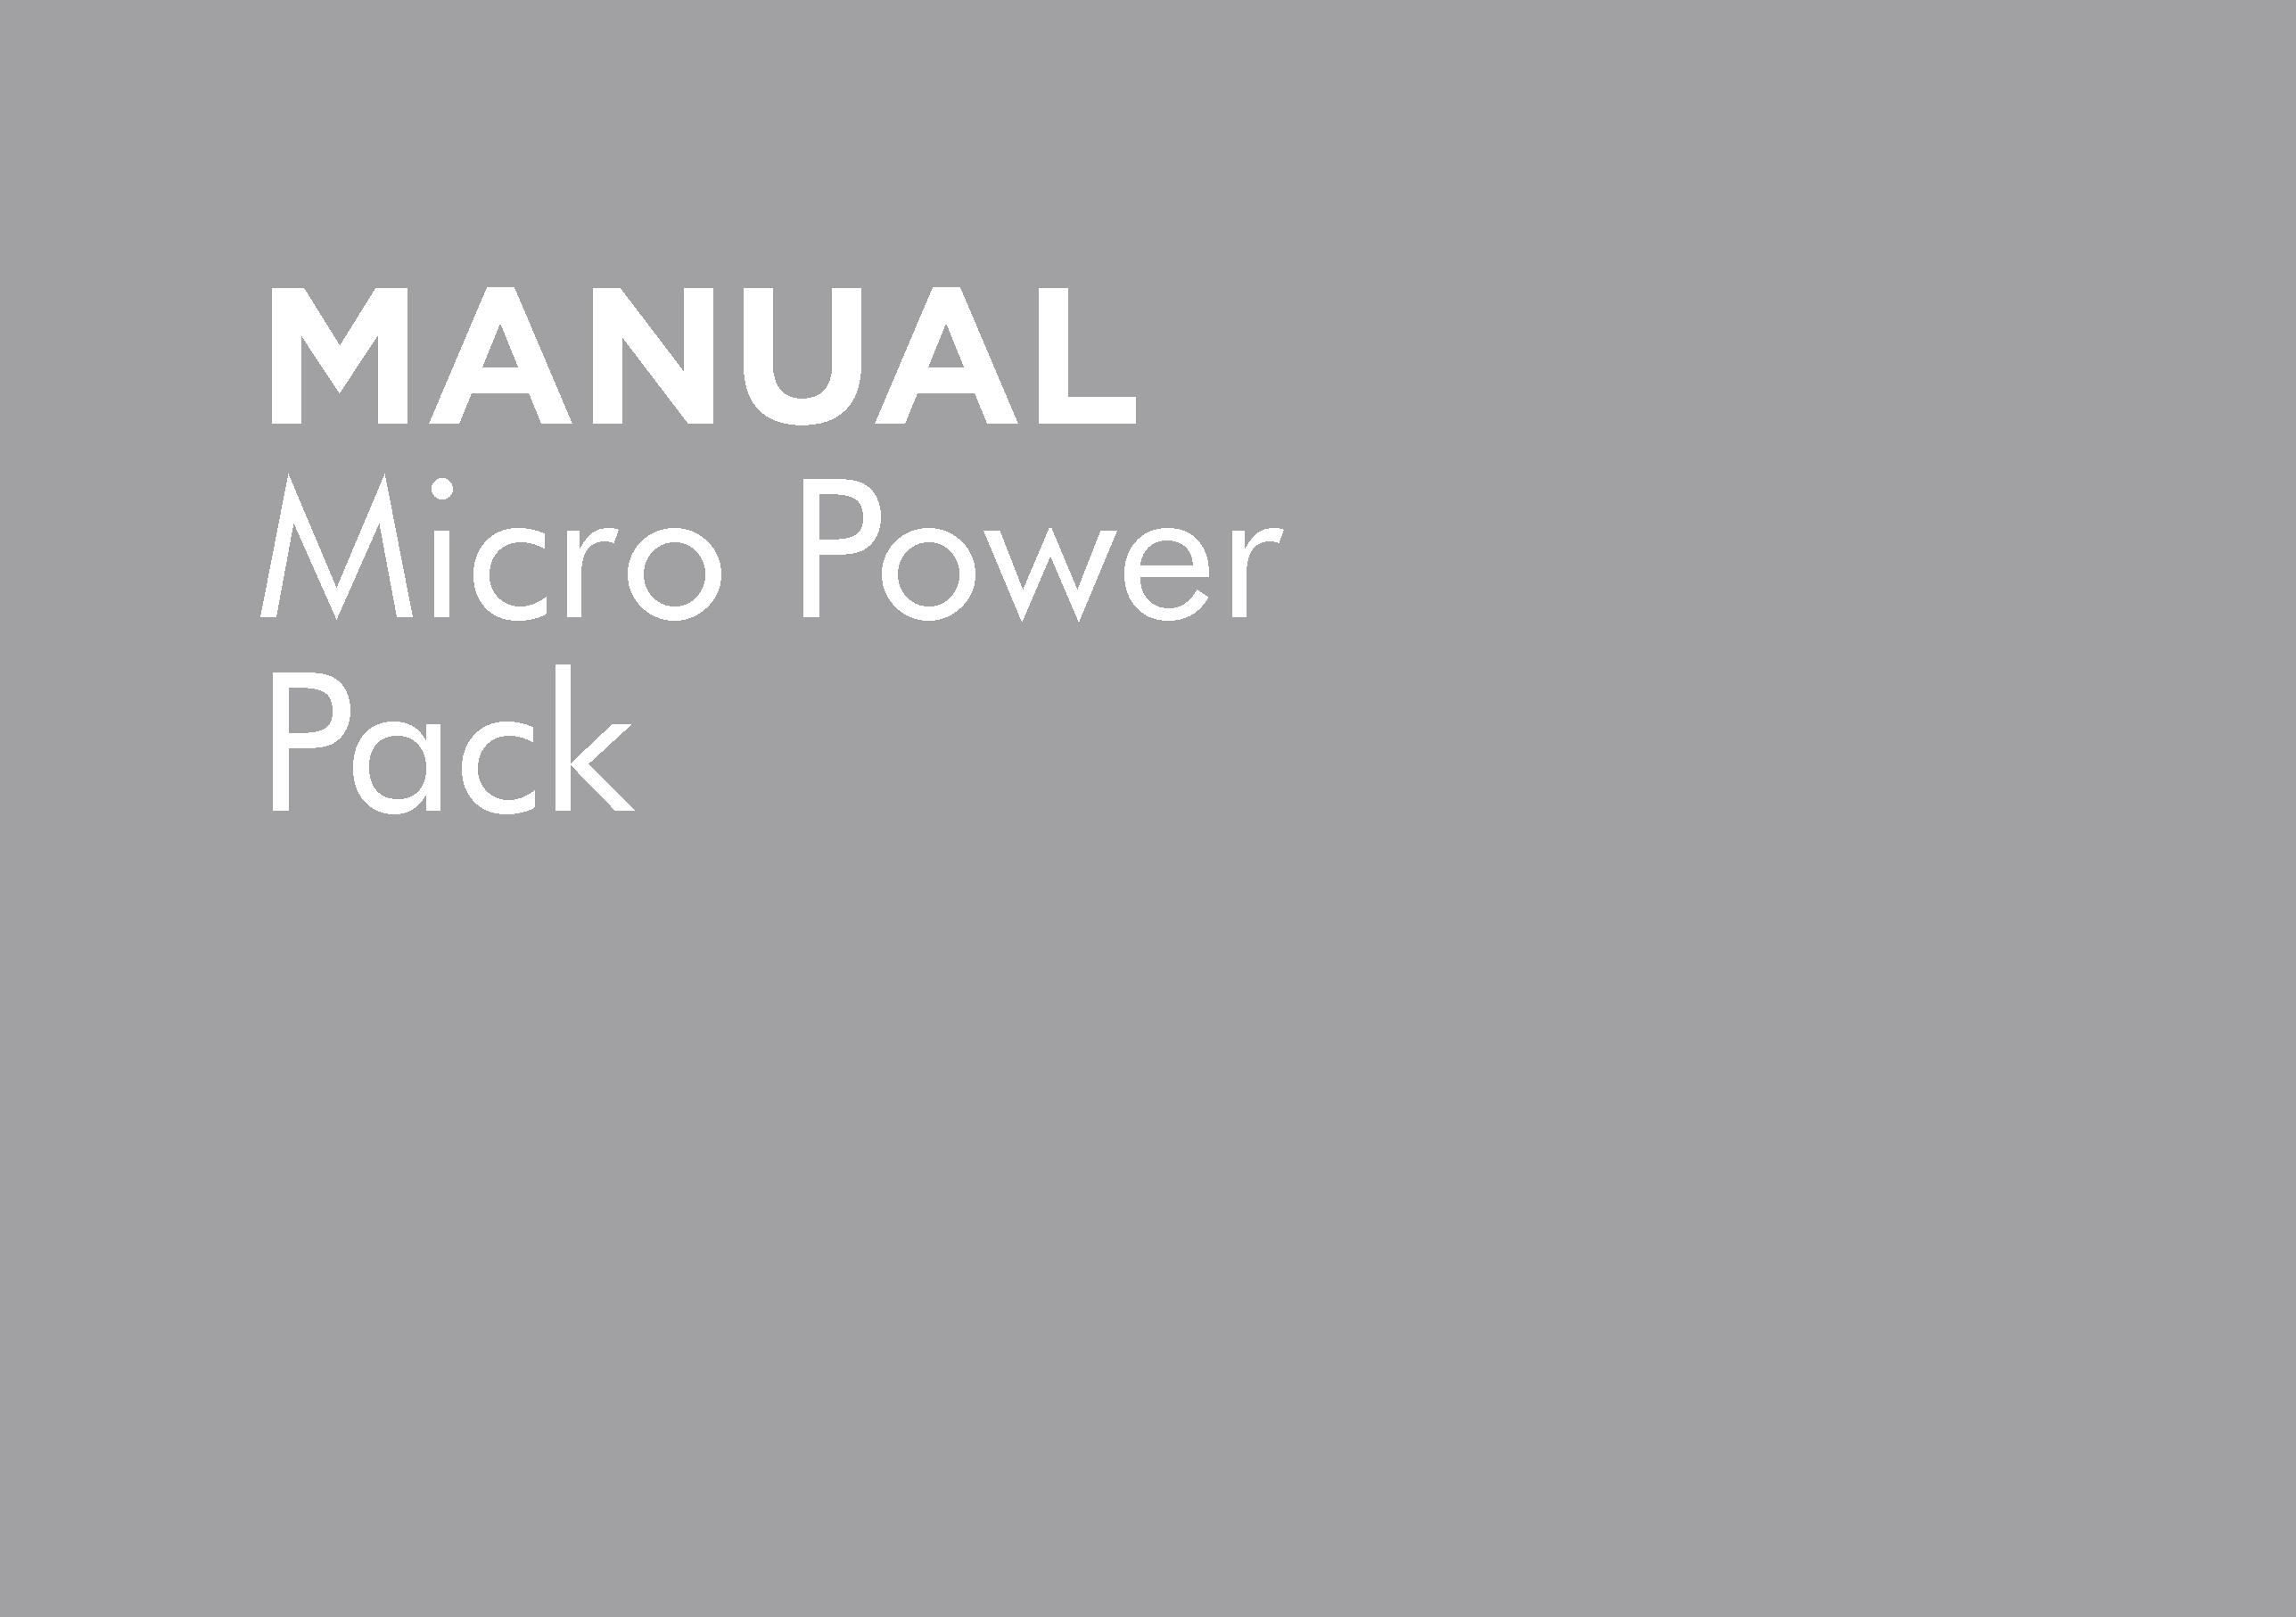 HT-OMMICRO-B – MICRO POWER PACK MANUAL VERSION B